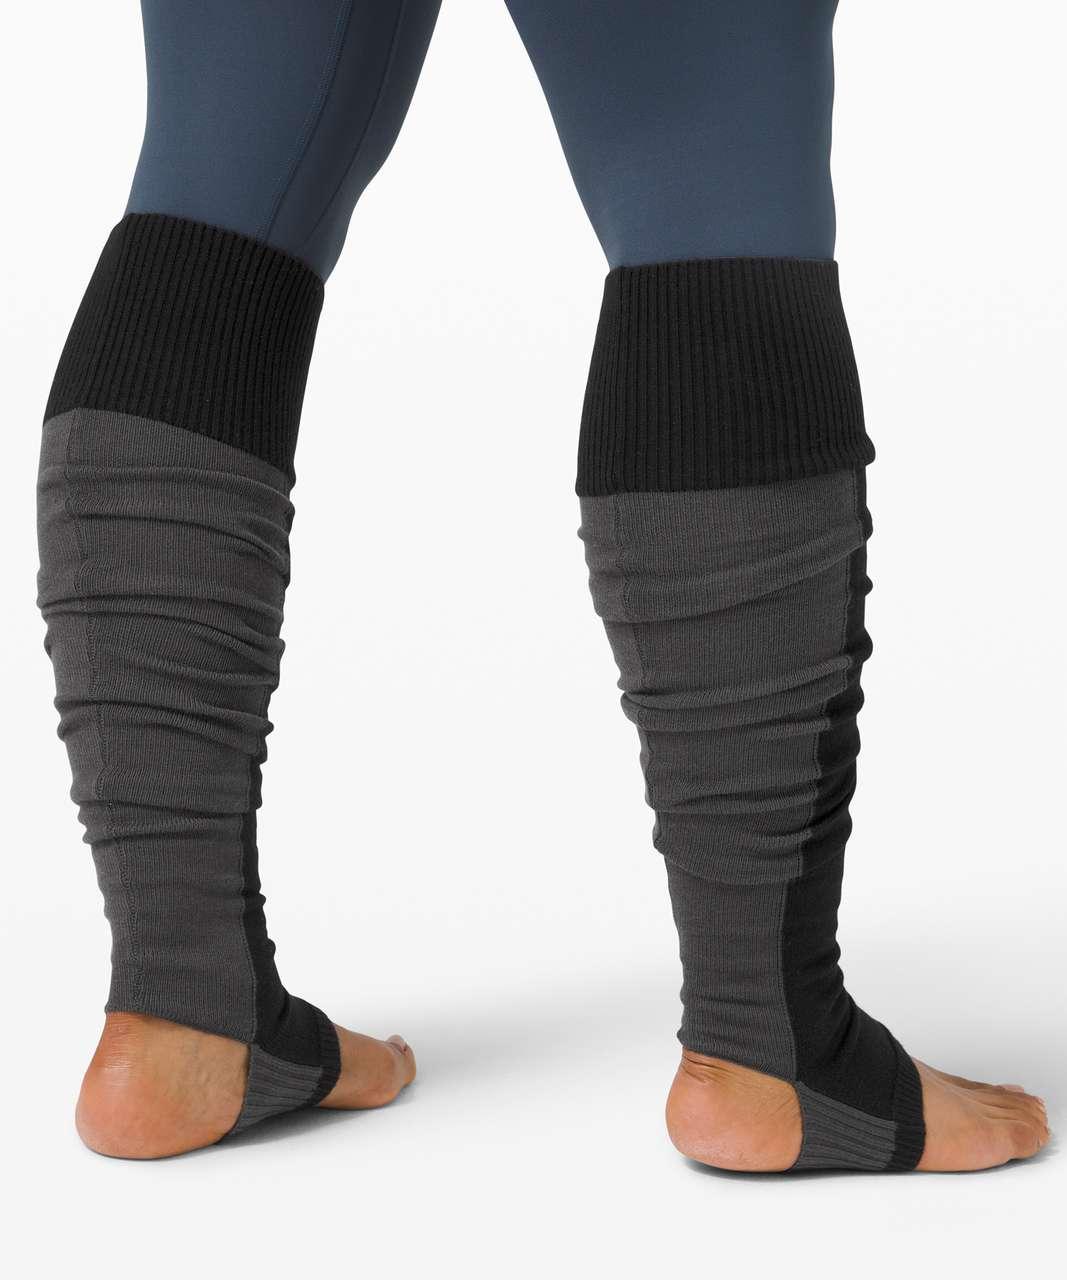 Lululemon Evolution Leg Warmer - Black / Graphite Grey